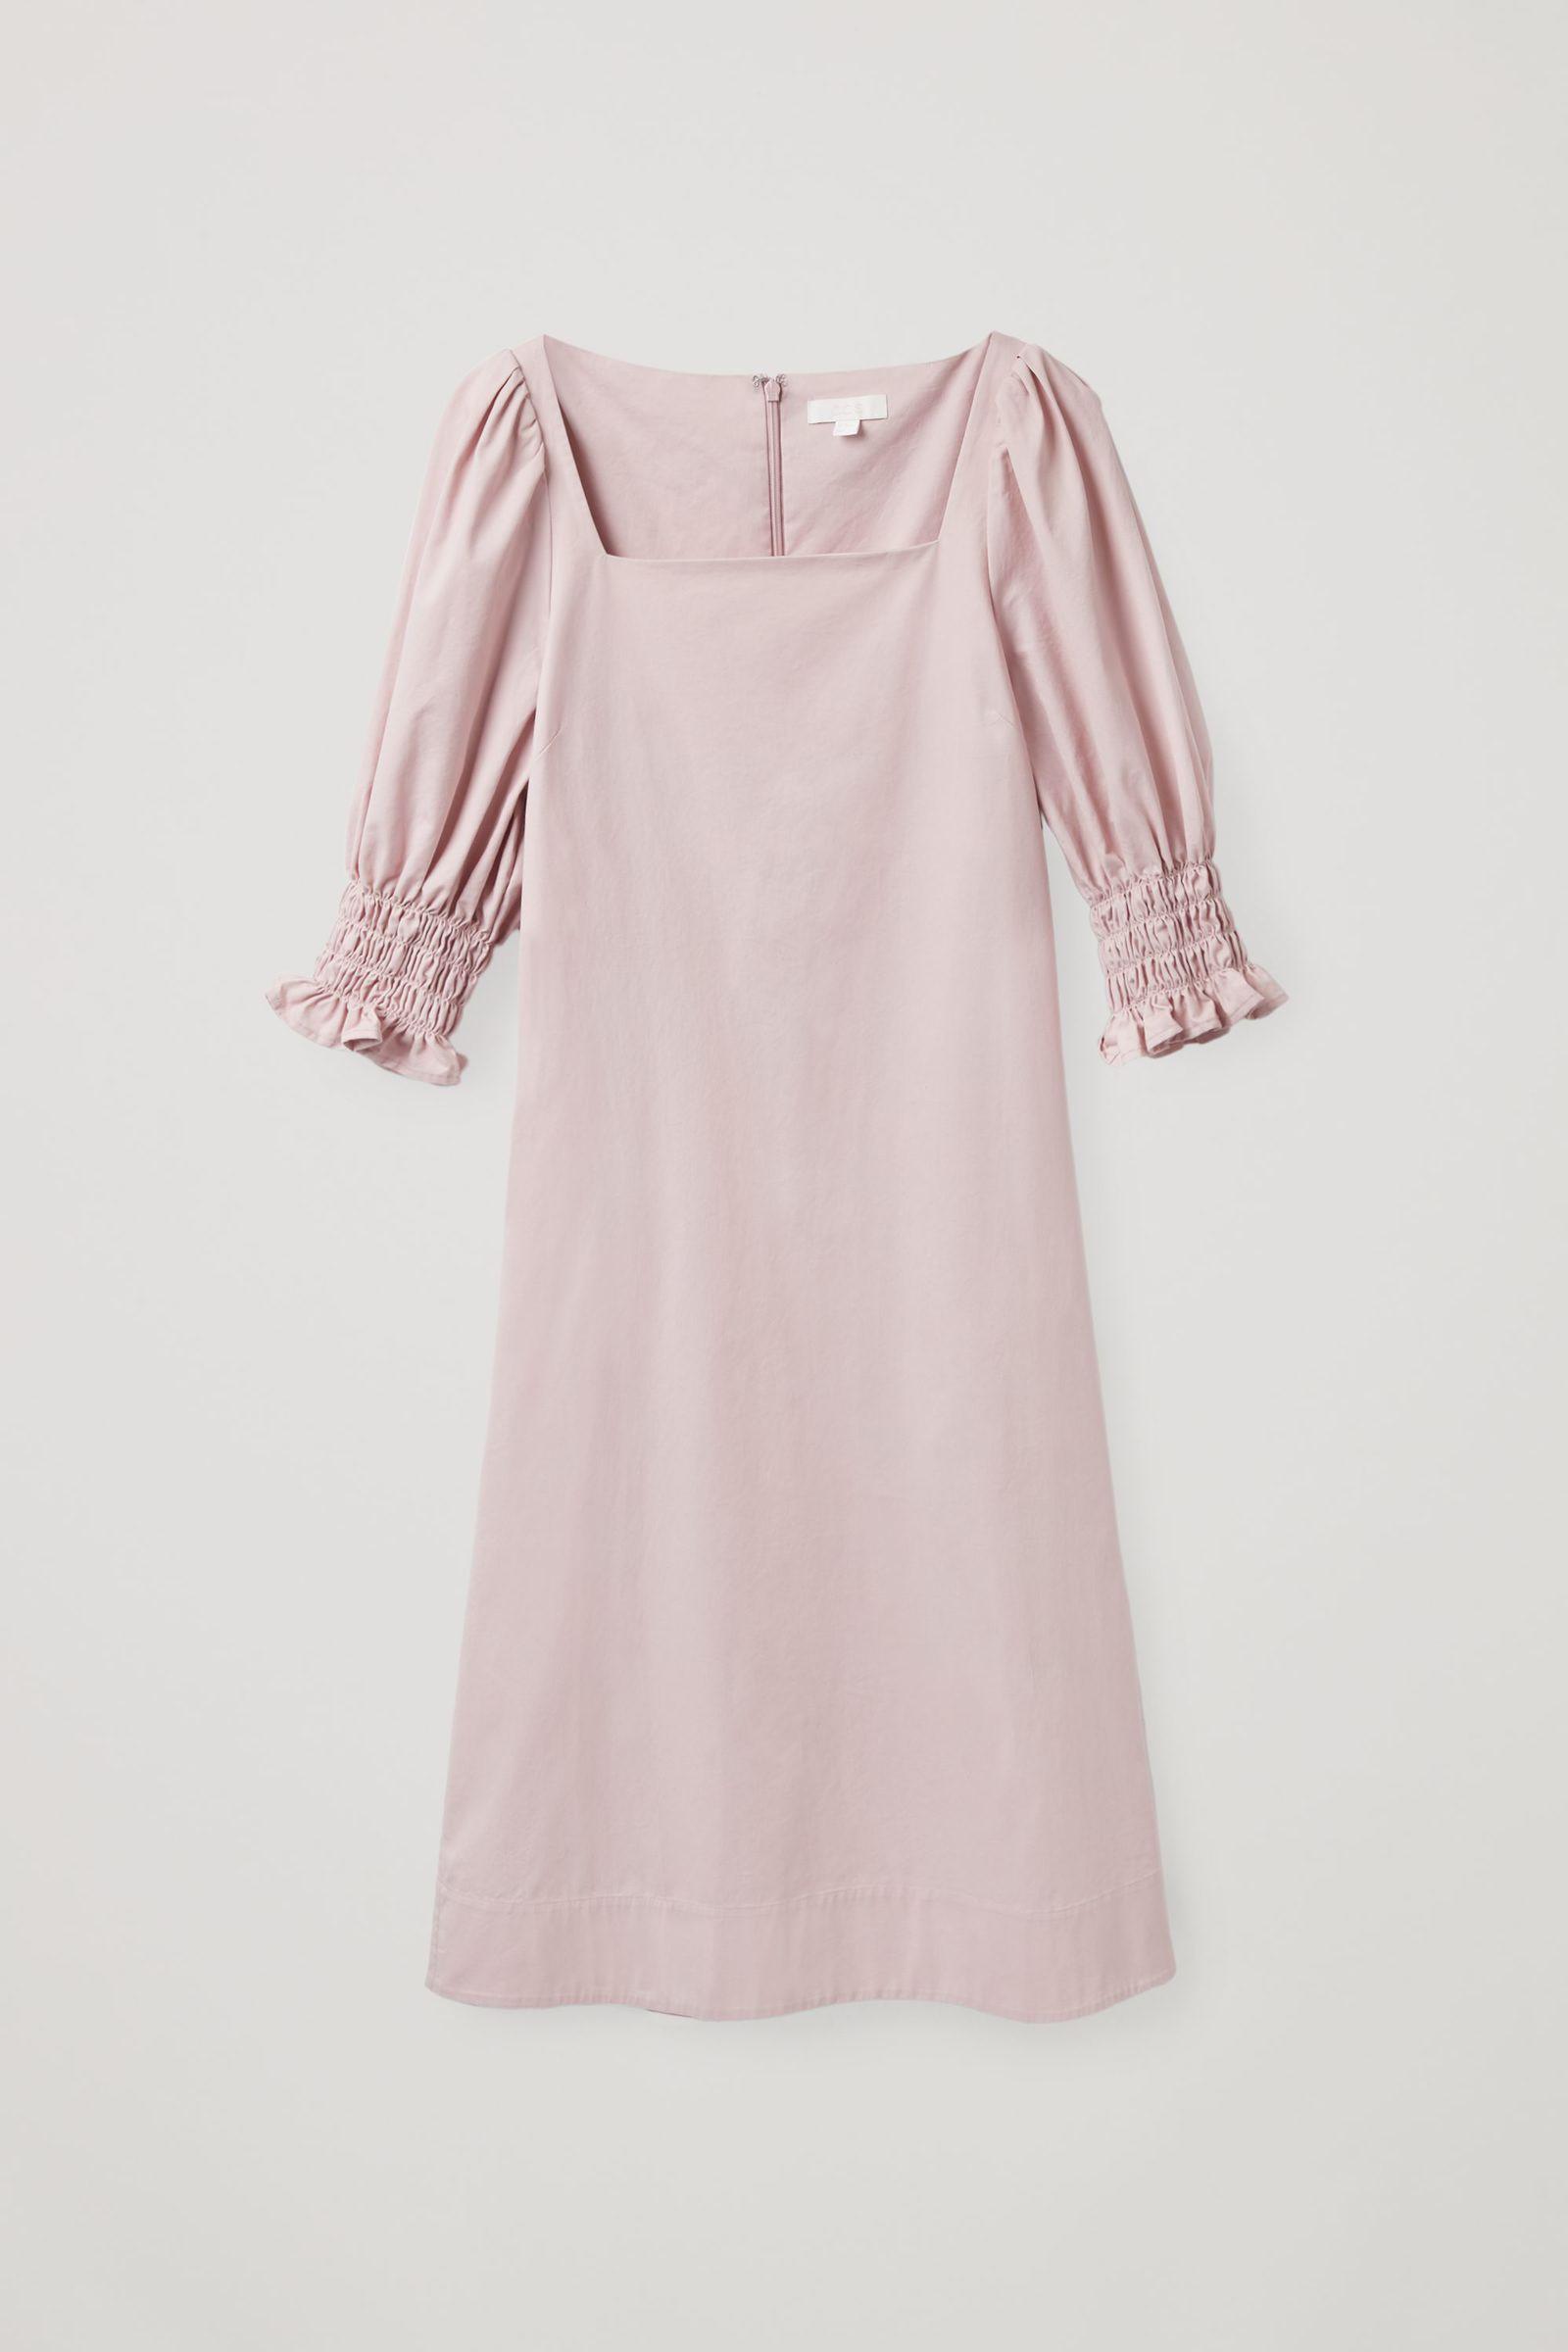 COS 스퀘어 넥 스모킹 드레스의 더스티 핑크컬러 Product입니다.